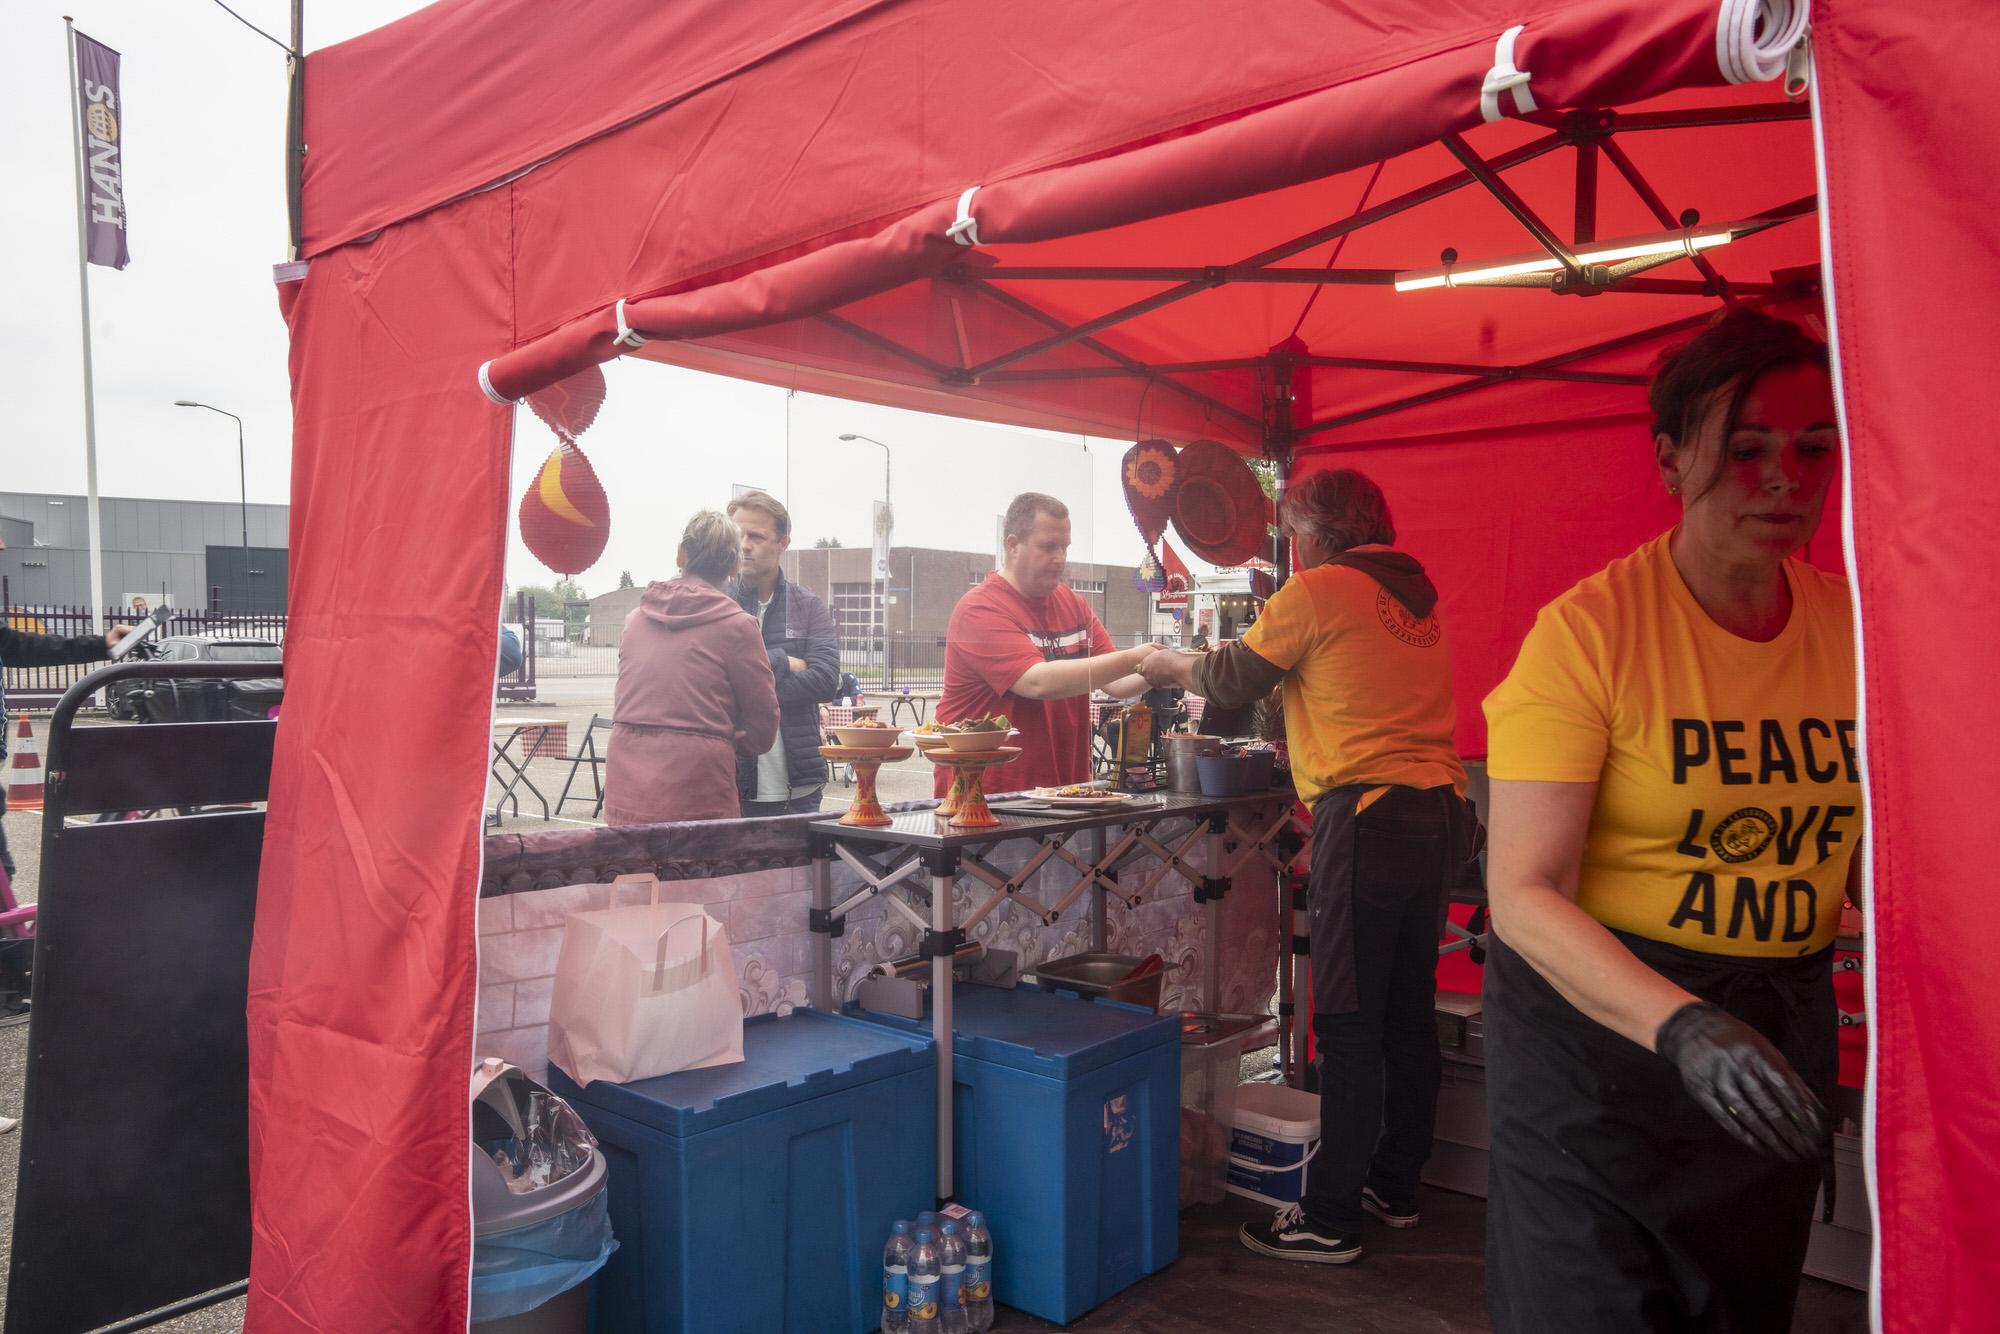 SPIJS-foodfestival-5juni21-00071.jpg